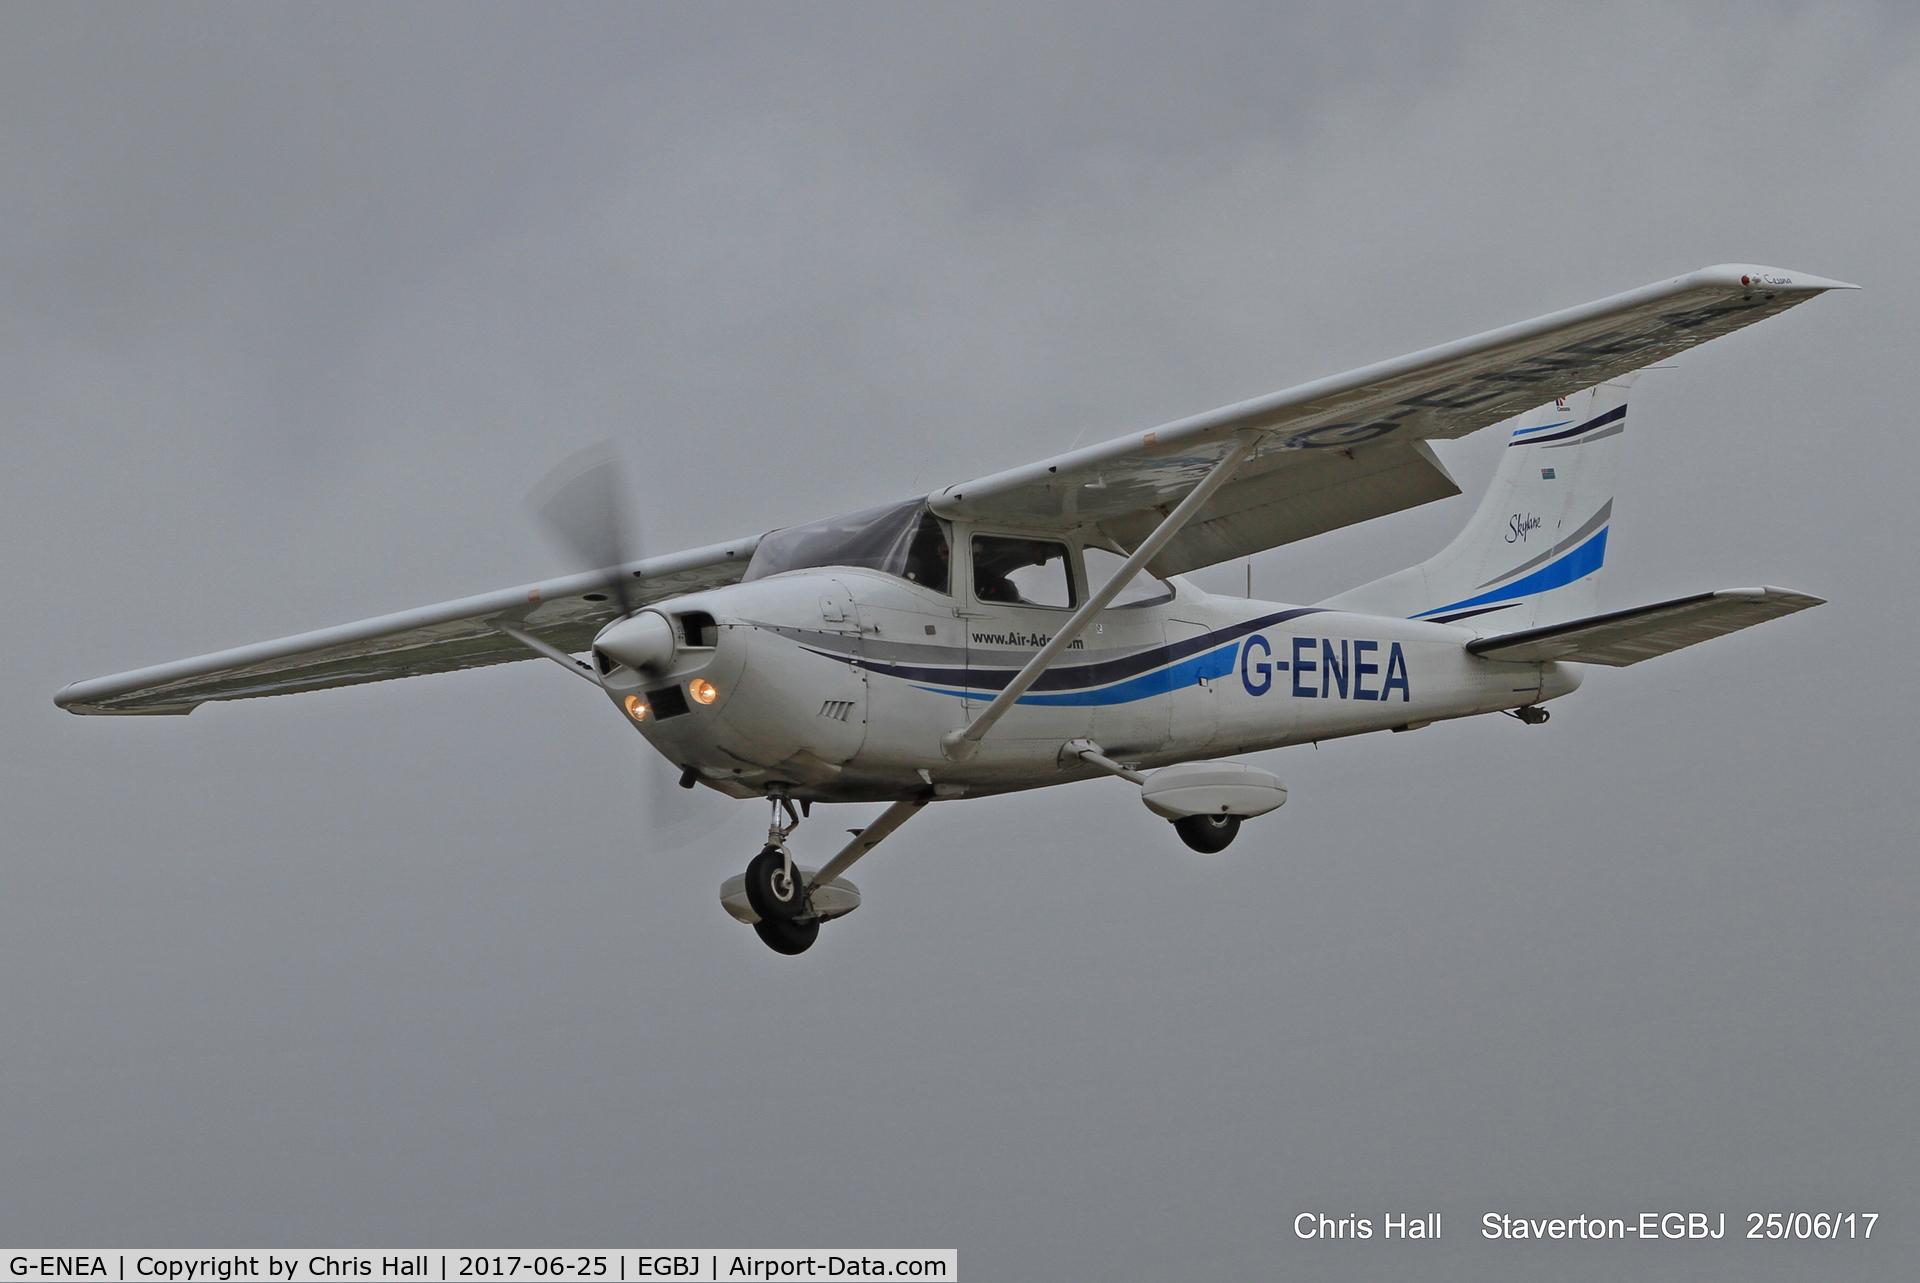 G-ENEA, 1971 Cessna 182P Skylane C/N 182-60895, Project Propeller at Staverton